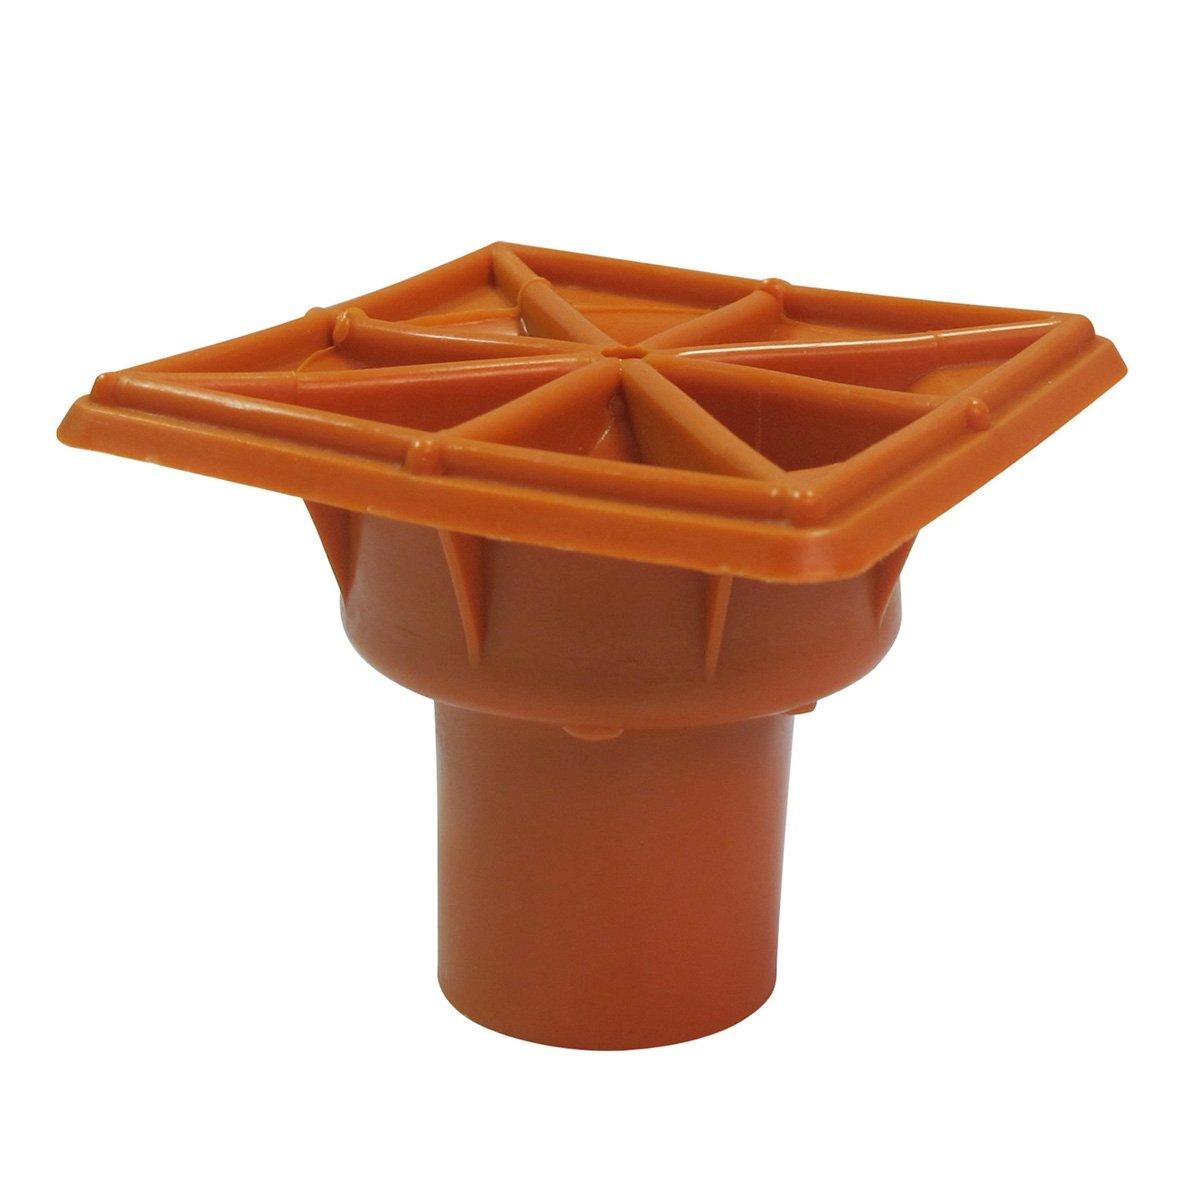 Rebar Cap, Orange,''DSC10, 25 Cal, Fits Rebar 3-#7, OSHA, 16910, Lot 25 by ERB